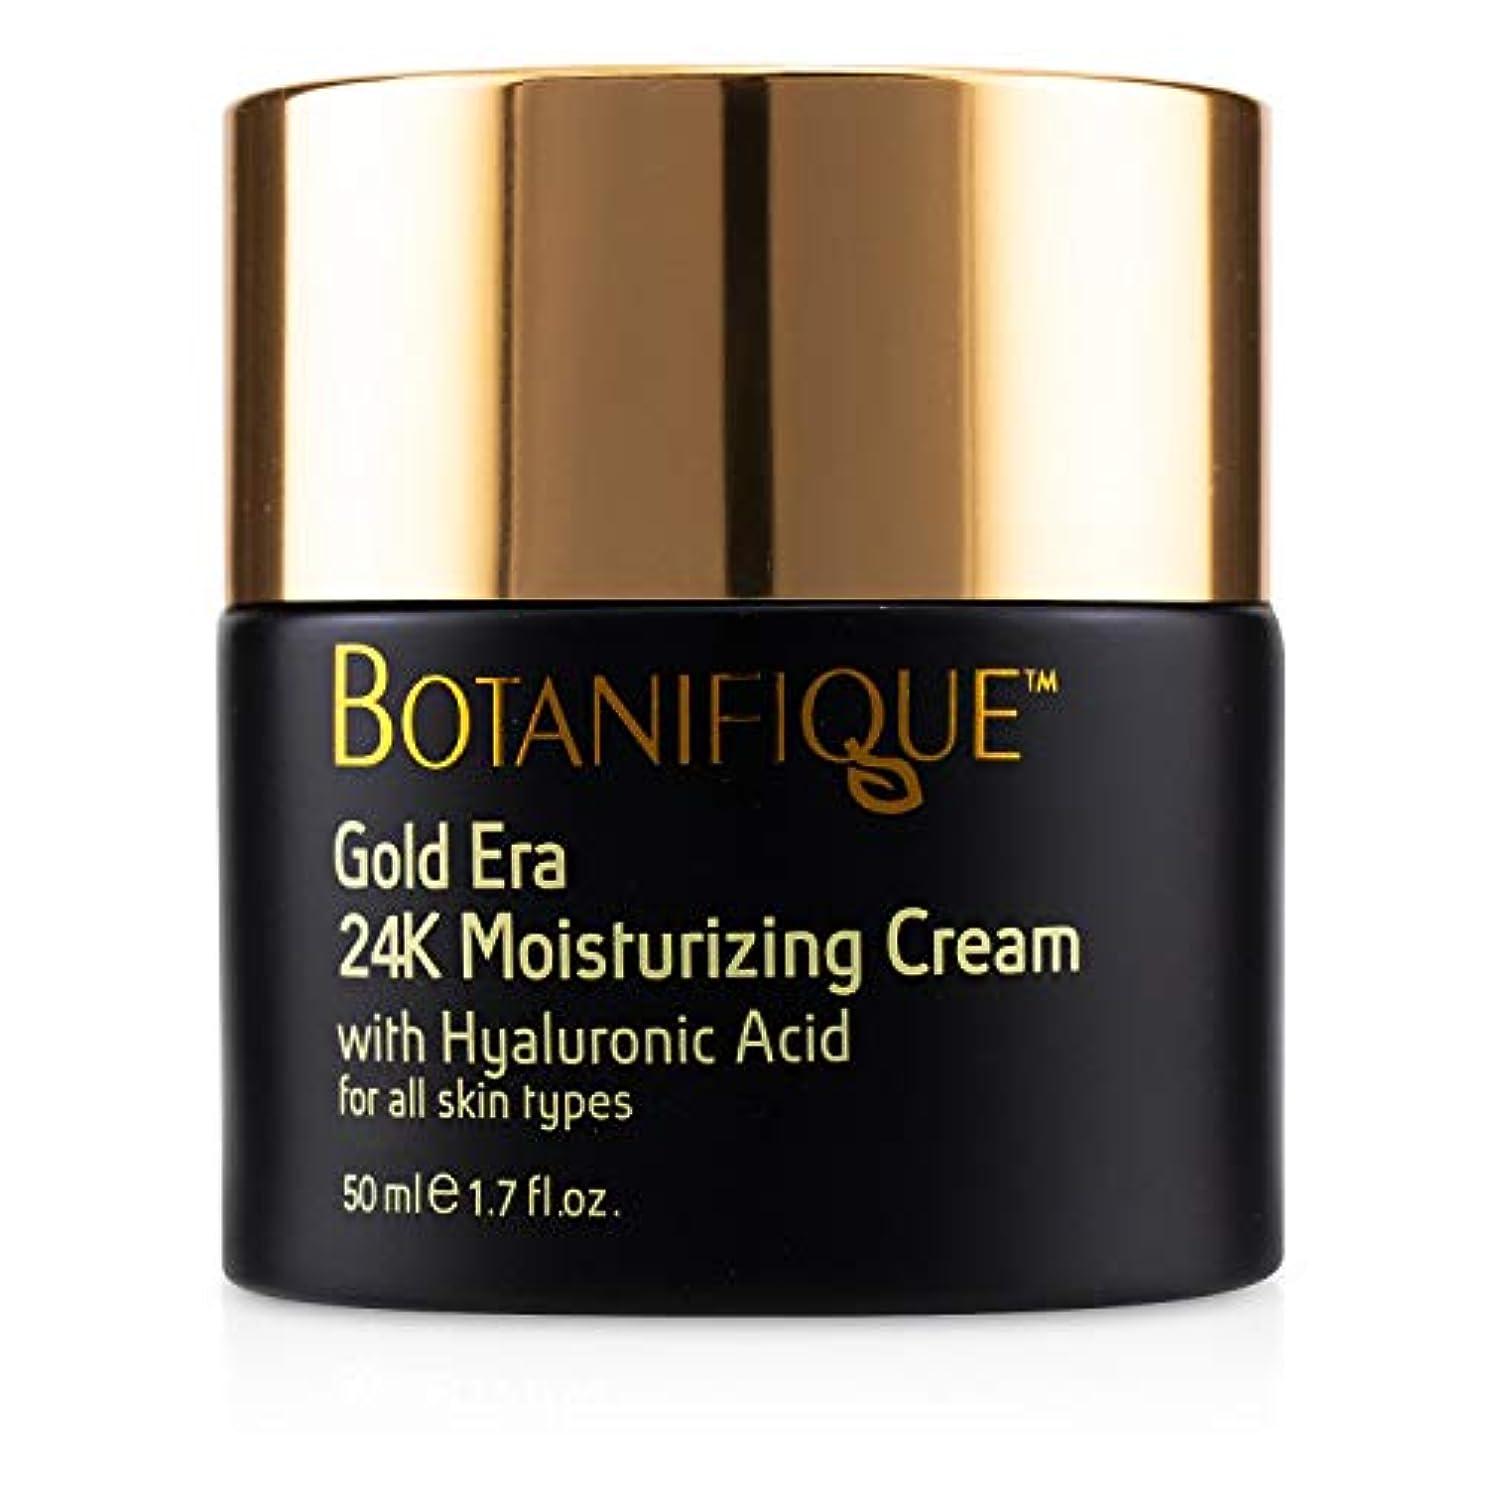 Botanifique Gold Era 24K Moisturizing Cream 50ml/1.7oz並行輸入品